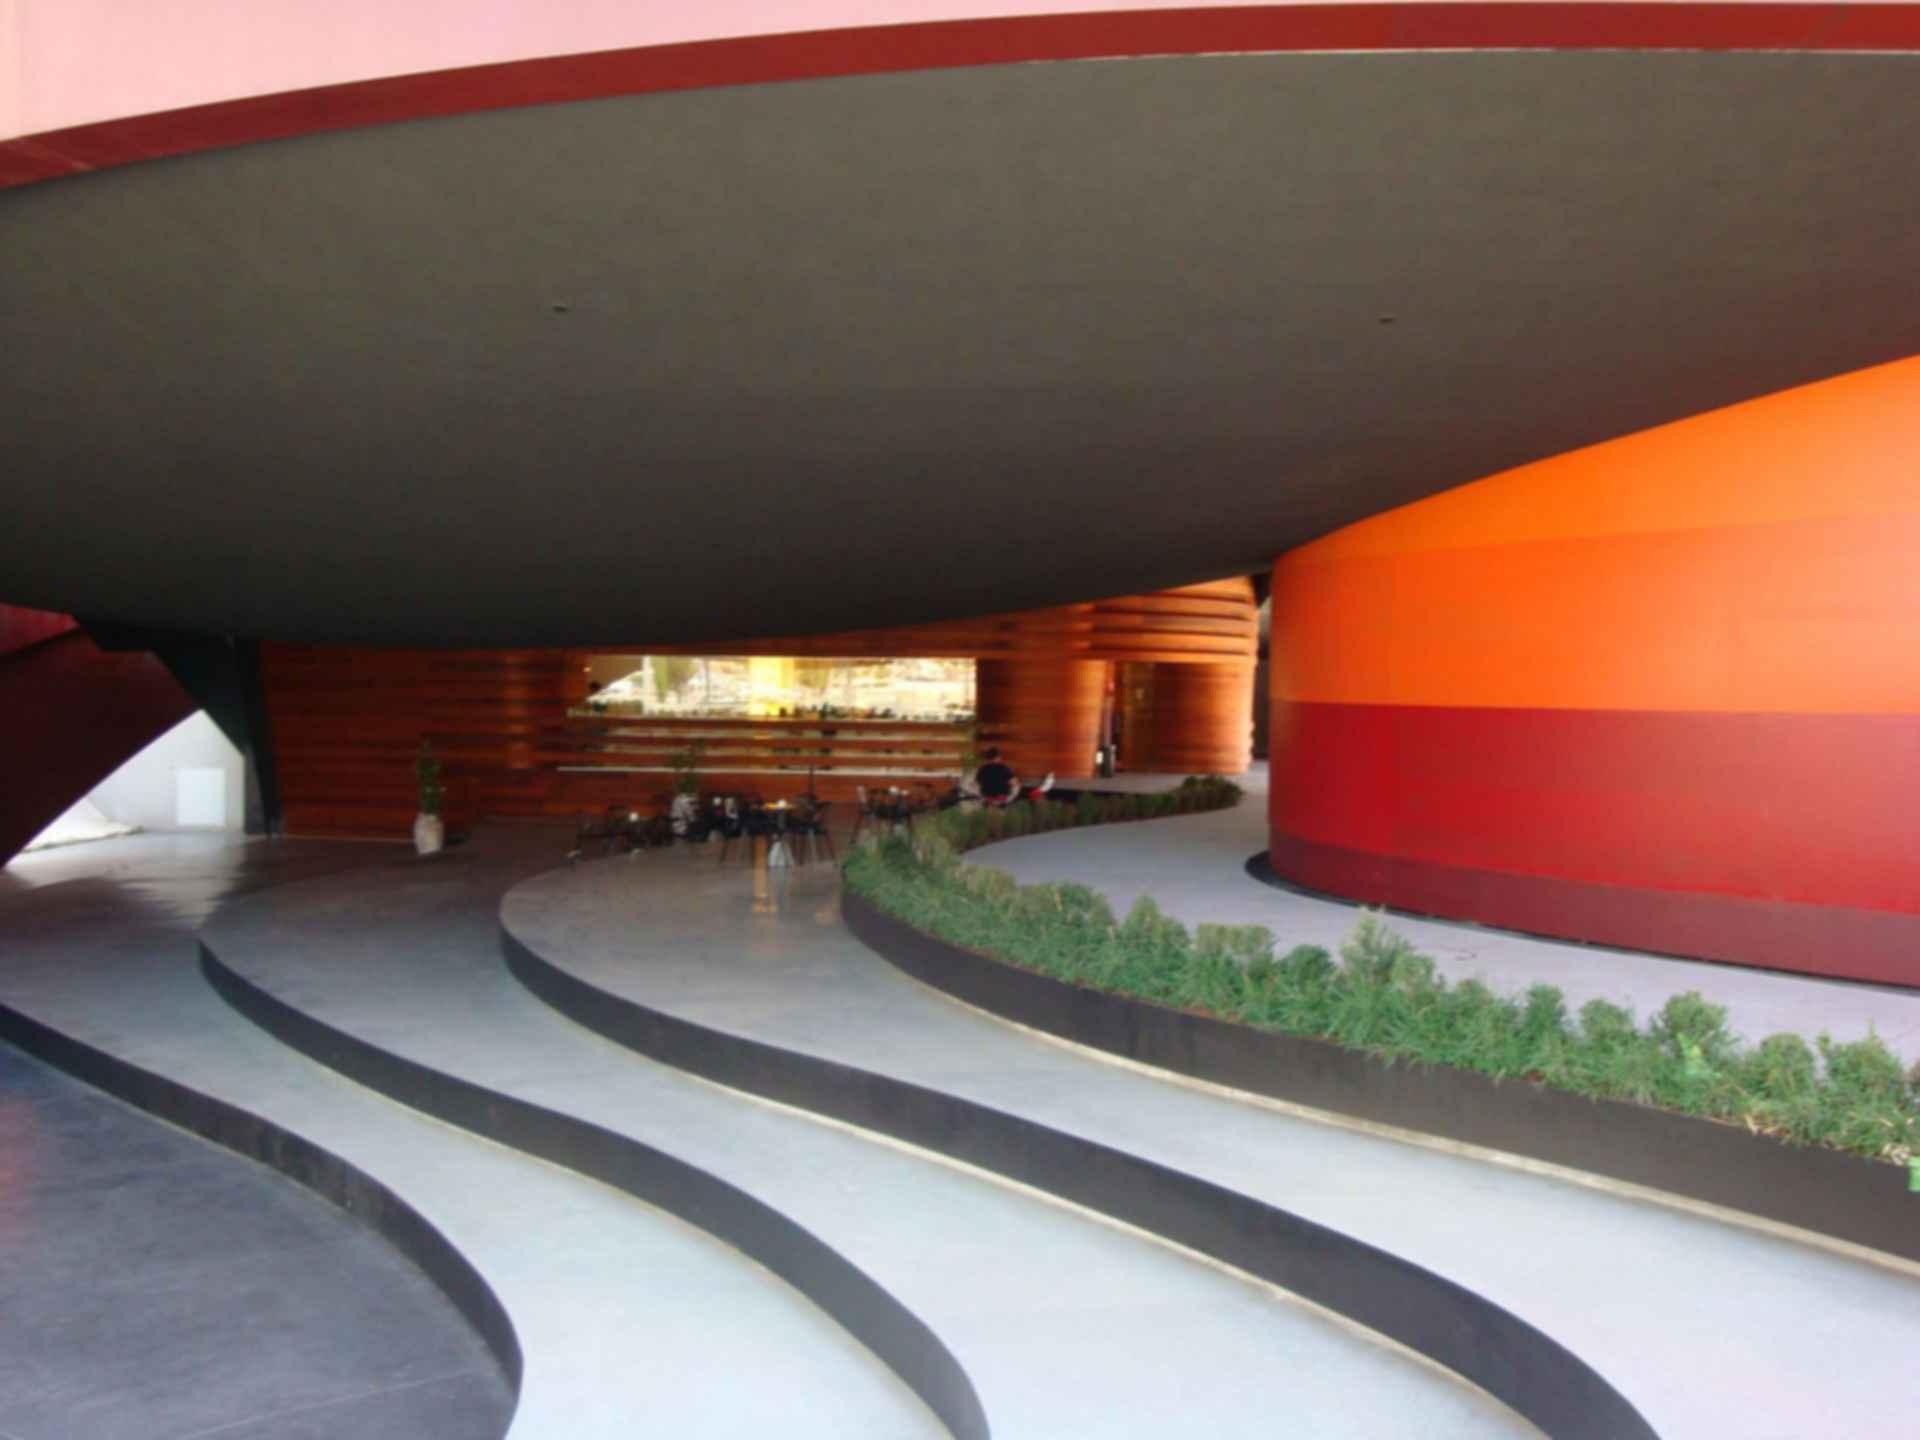 Design Museum Holon - Exterior/Entrance